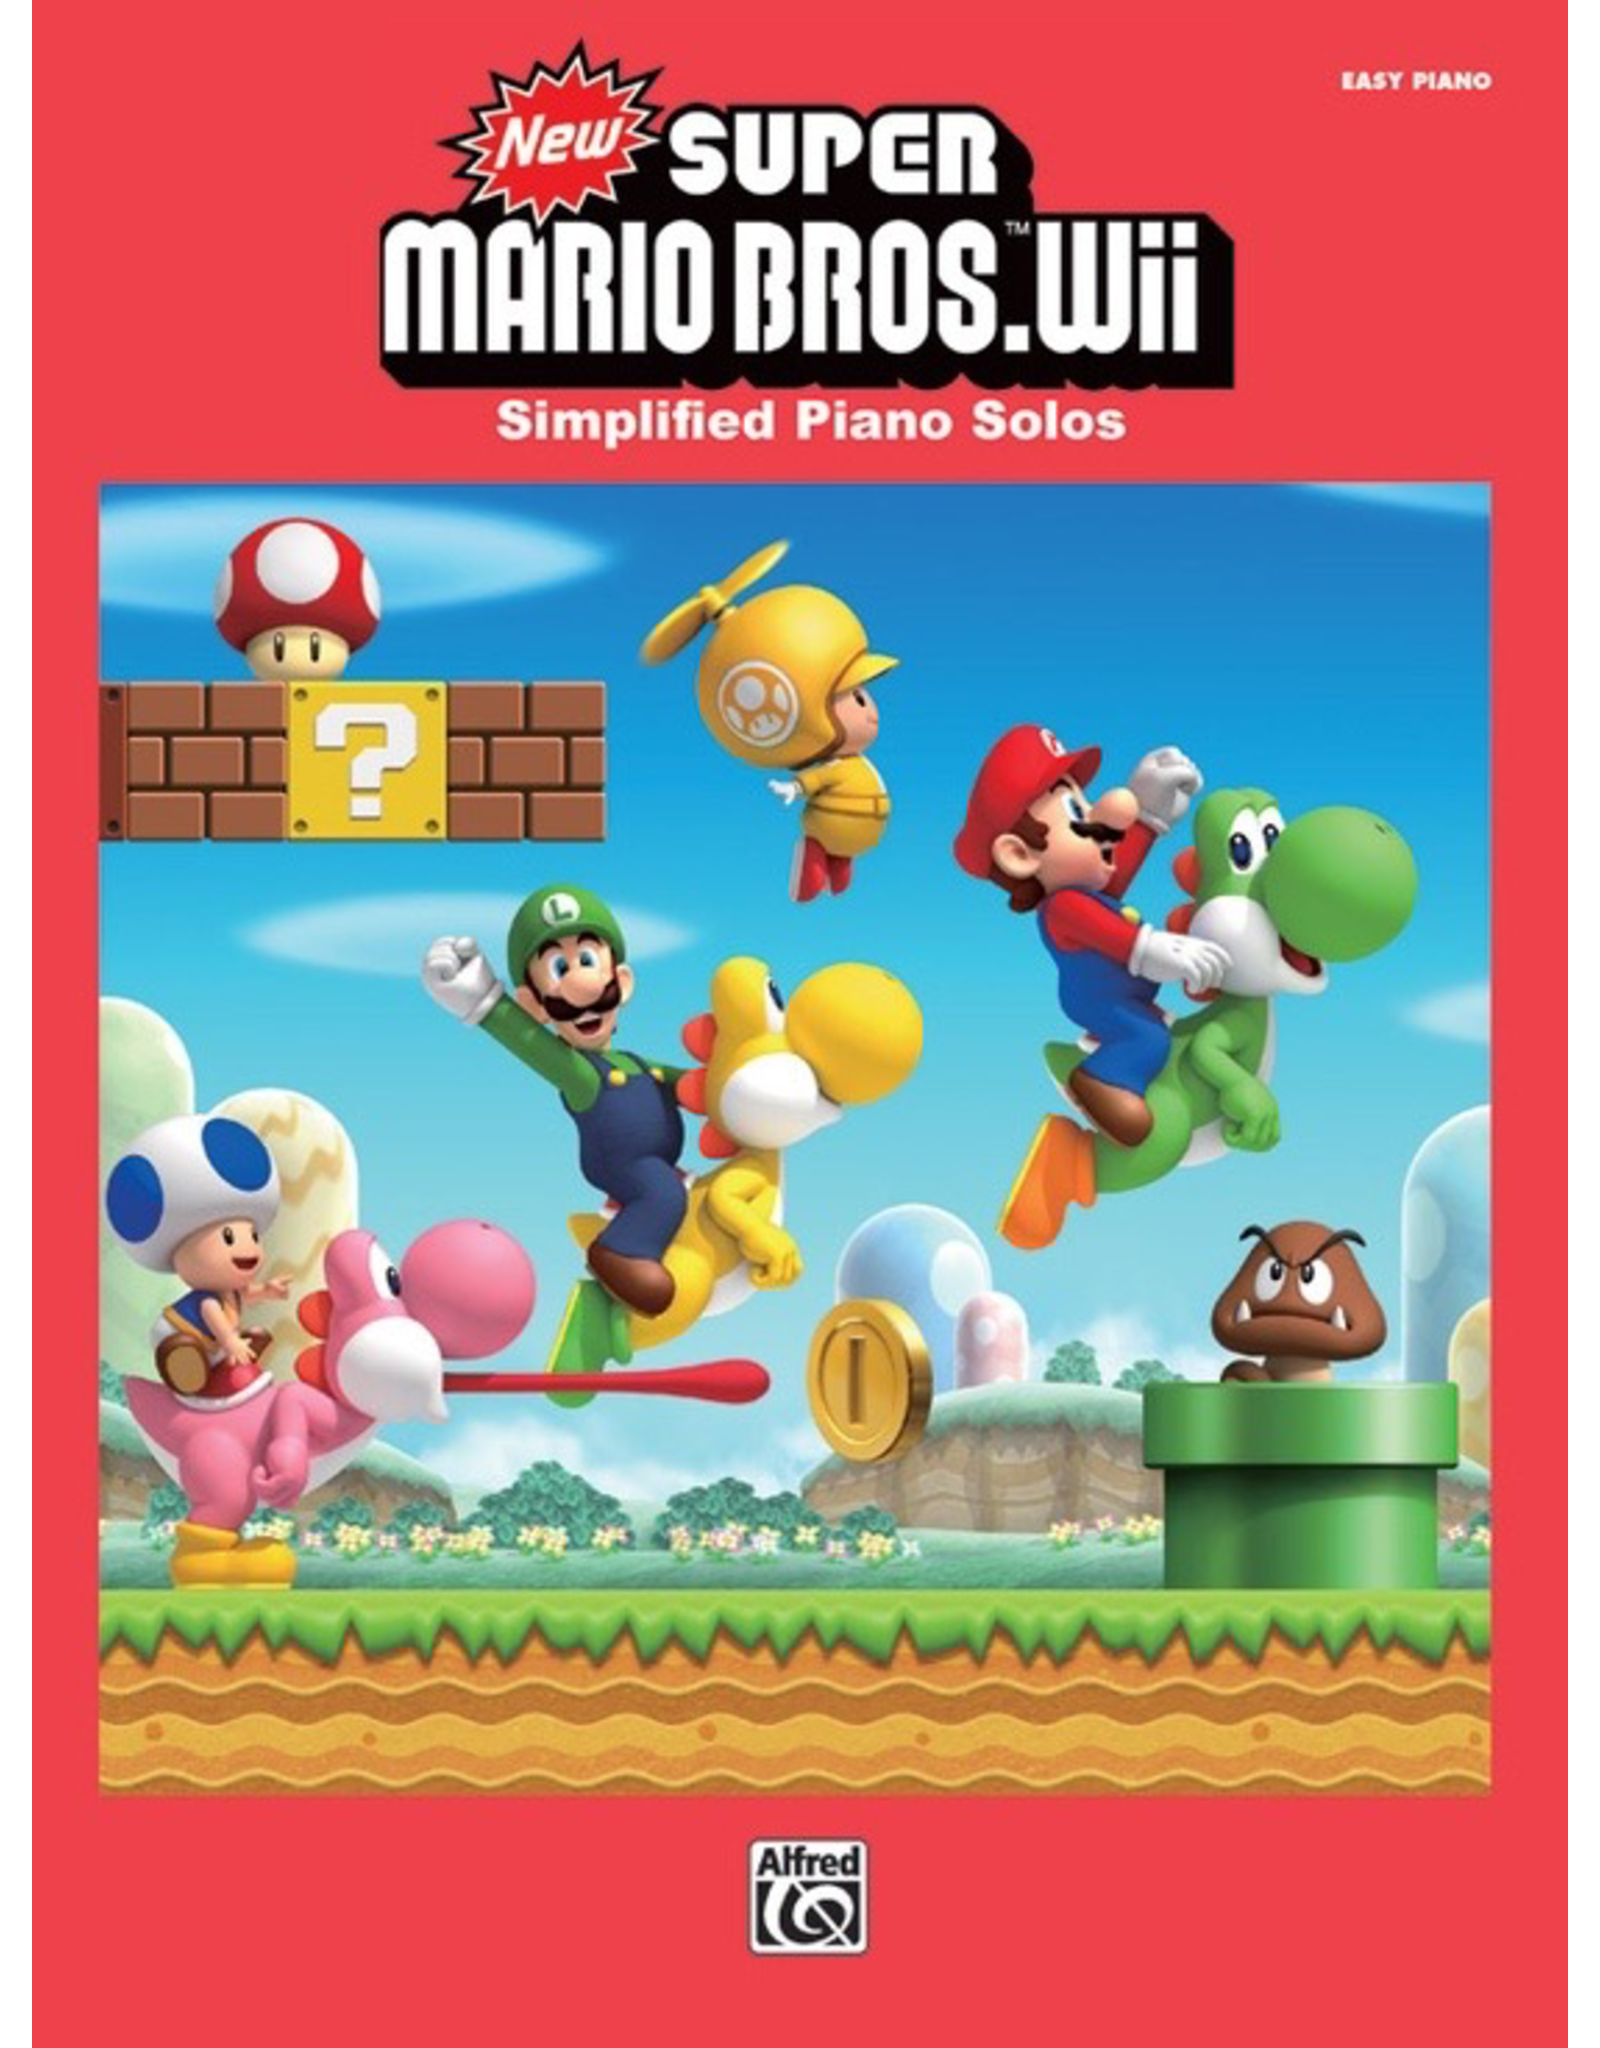 Alfred New Super Mario Bros. Wii - Easy Piano